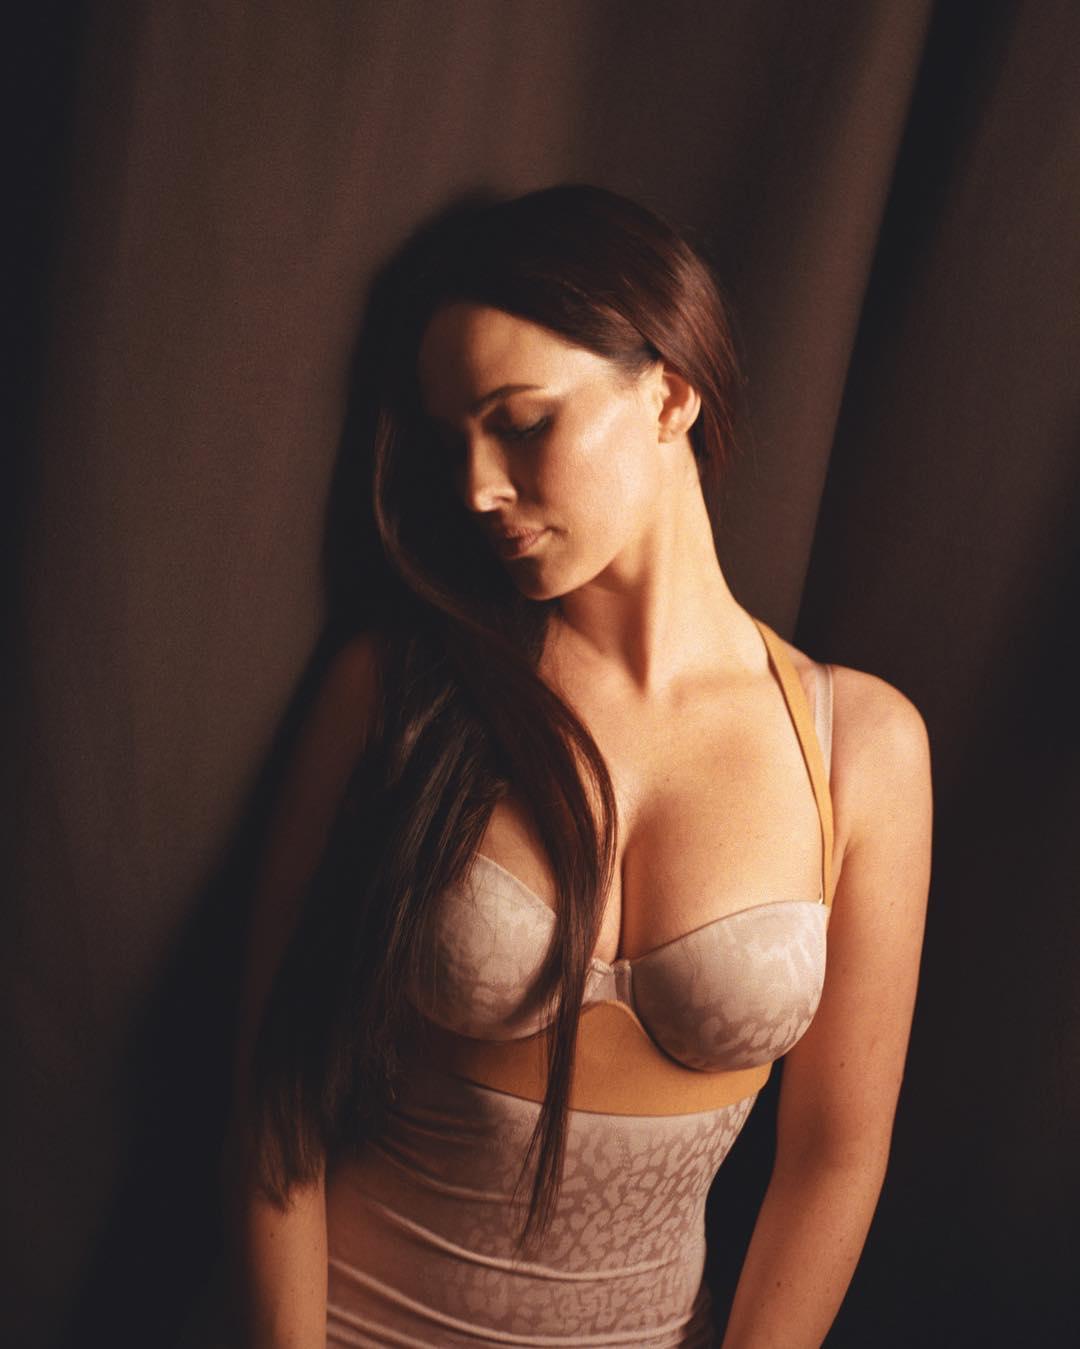 Даша Астафьева: Мой милый гений @nickyashika Спасибо тебе за все твои таланты и любовь  #mua @mogila_tatiana #hair  @daniamartemianov #style @moy_sladkiy_fetish